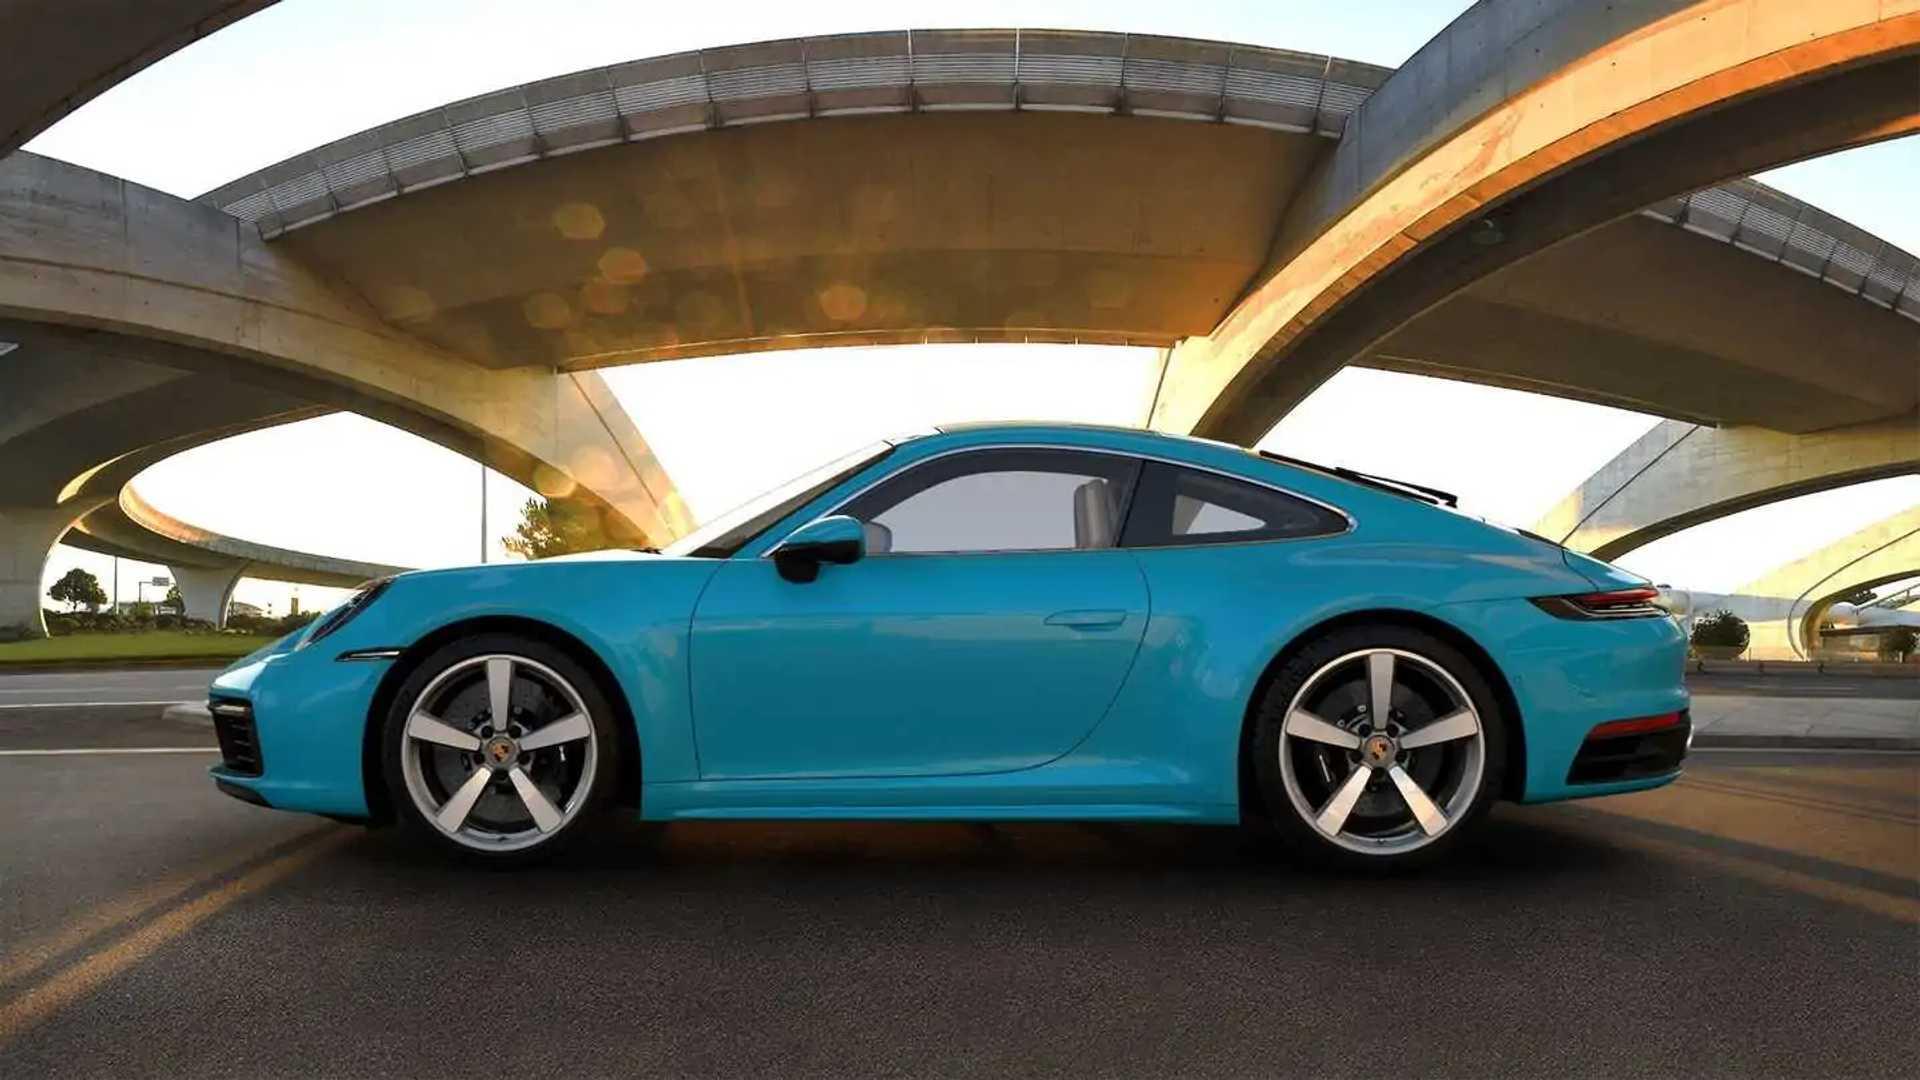 Most Expensive 2020 Porsche 911 Costs $192,900